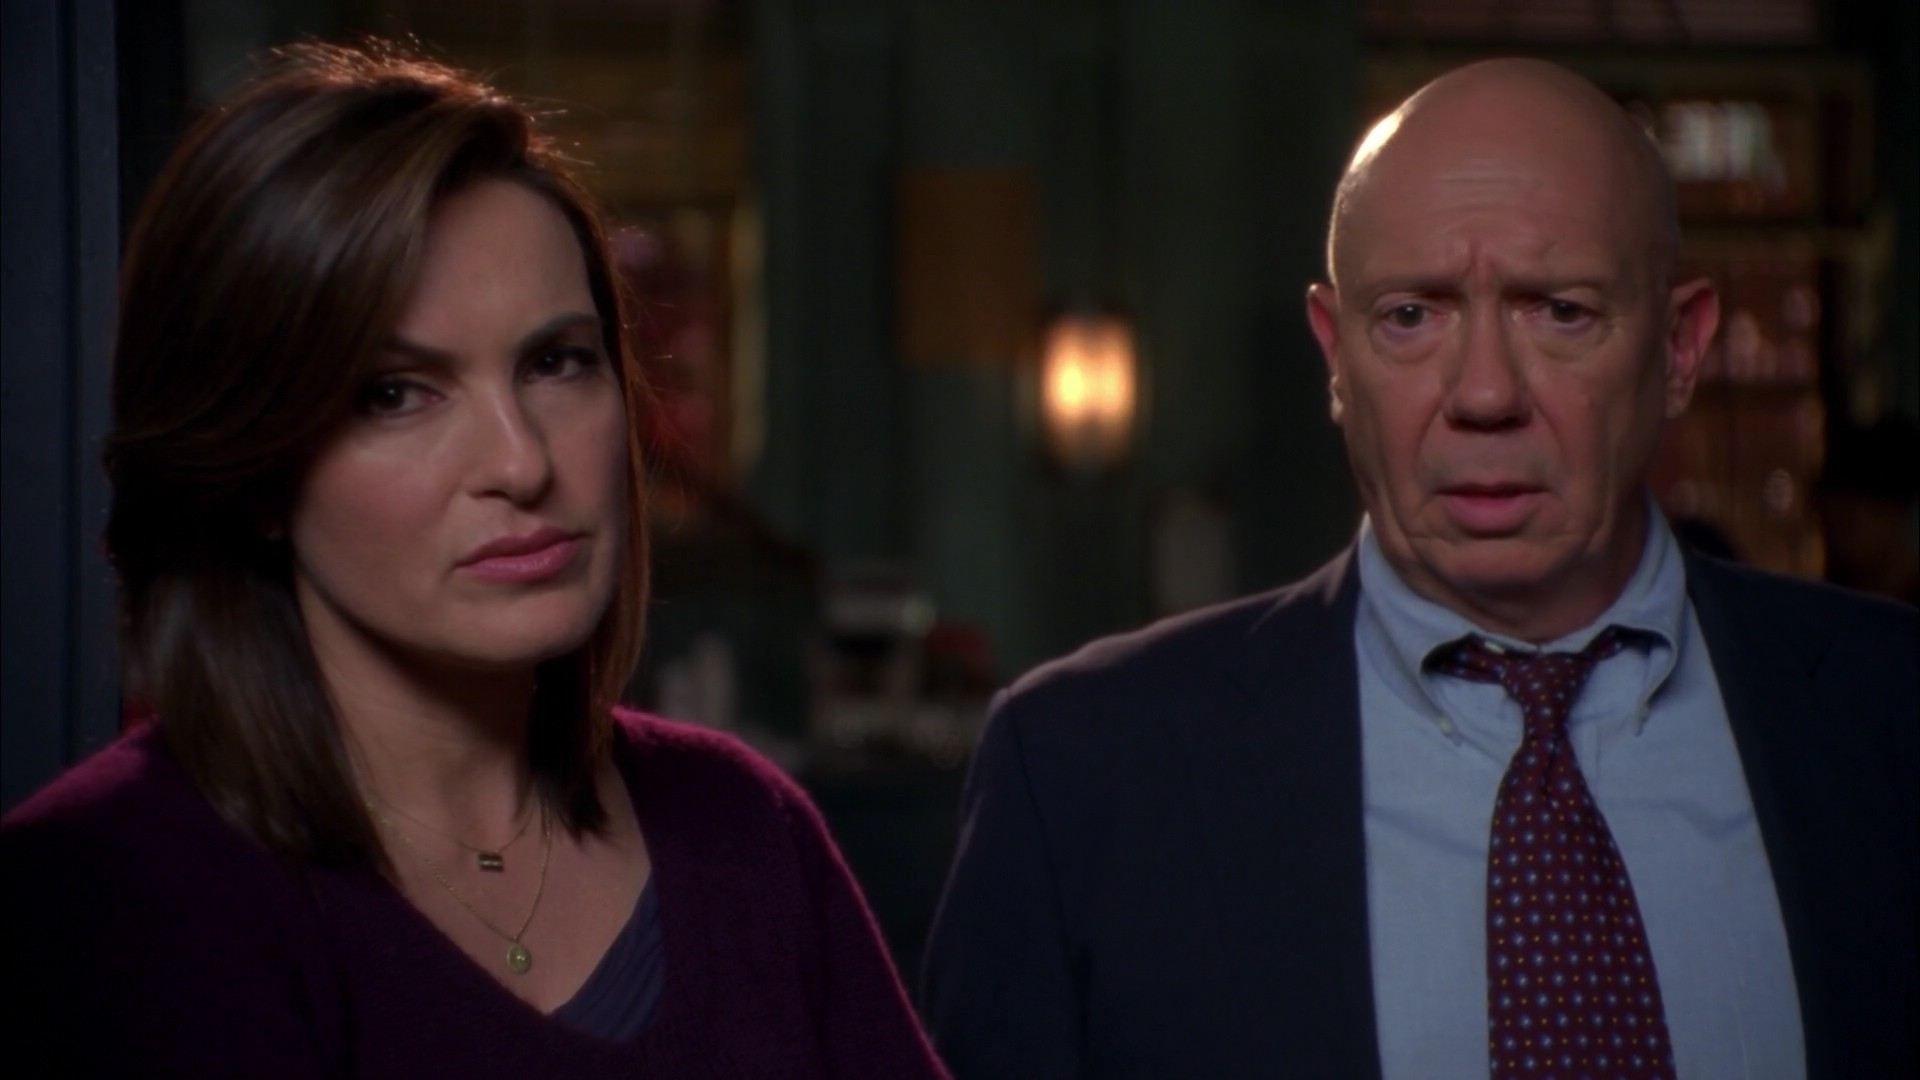 Detective Olivia Benson Captain Donald Cragen Law And Order Special Victims Unit Special Victims Unit Law And Order Svu